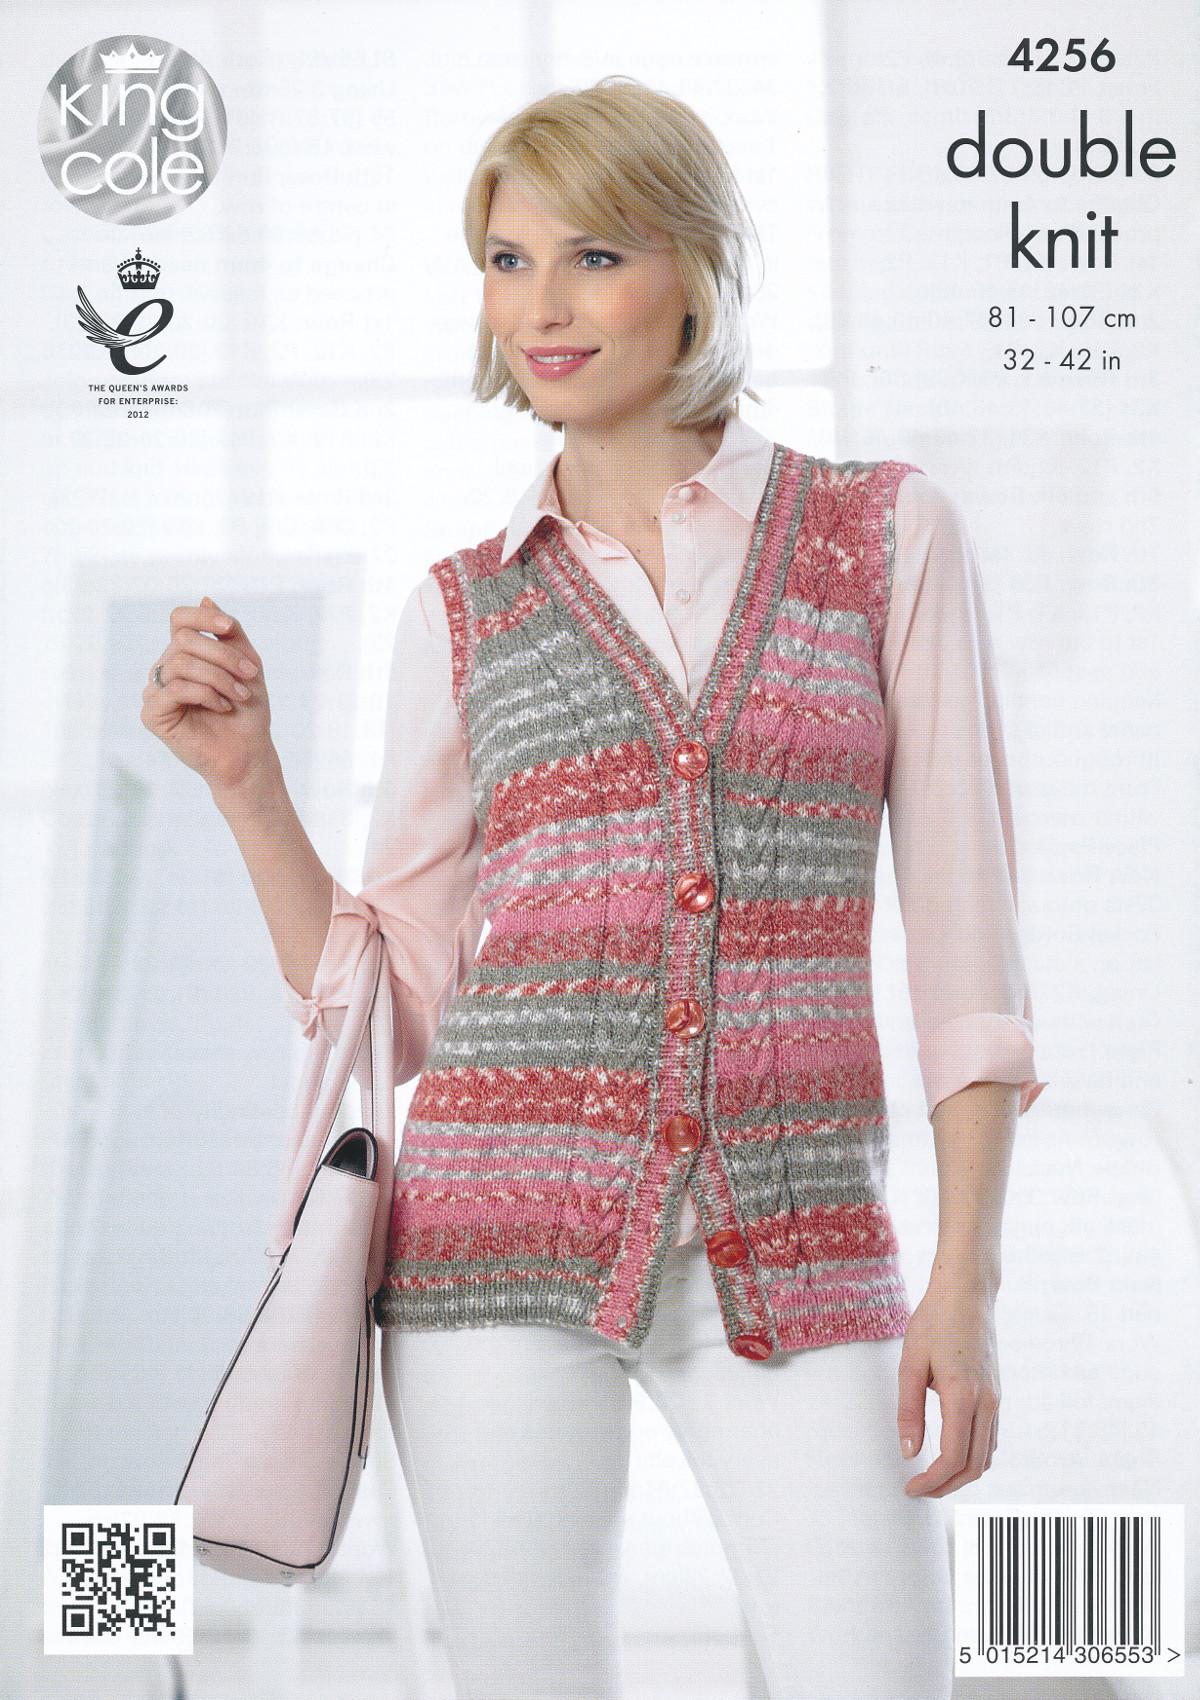 King Cole Ladies Cardigan Knitting Pattern : Womens Cable Knit Waistcoat Cardigan Knitting Pattern Drifter DK King Cole 42...